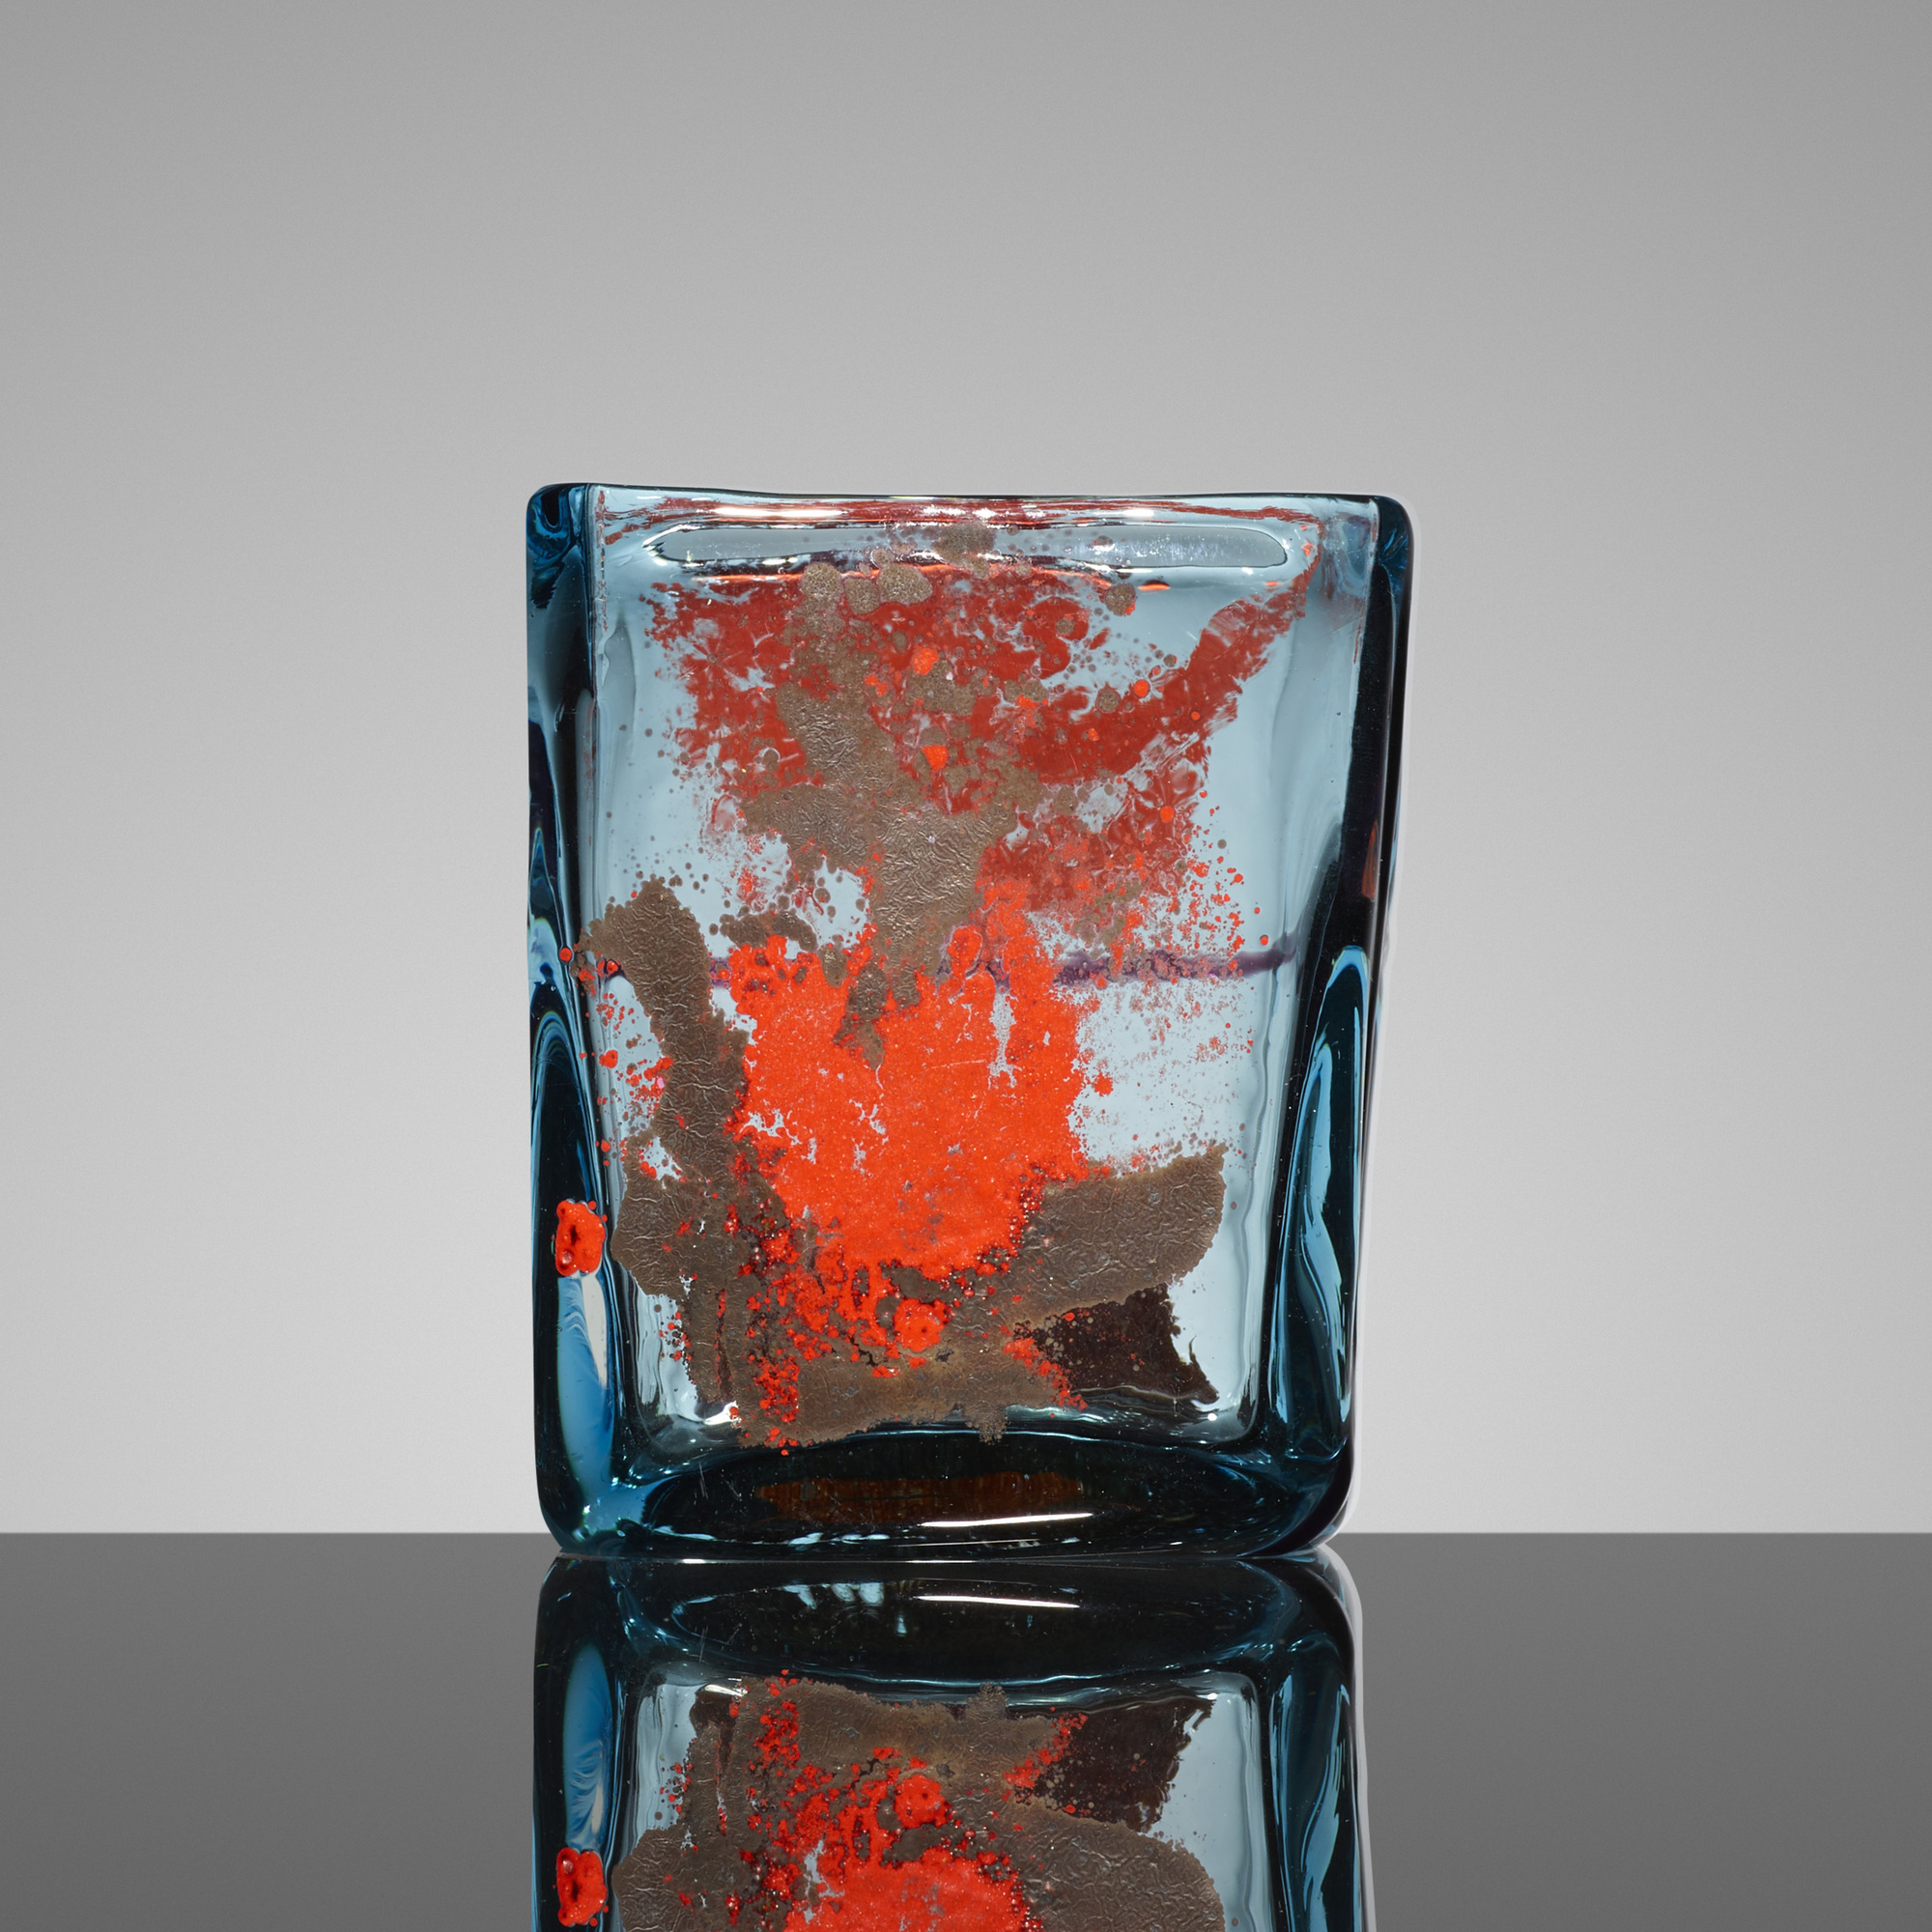 148: Fulvio Bianconi / Rettangolare vase (1 of 3)